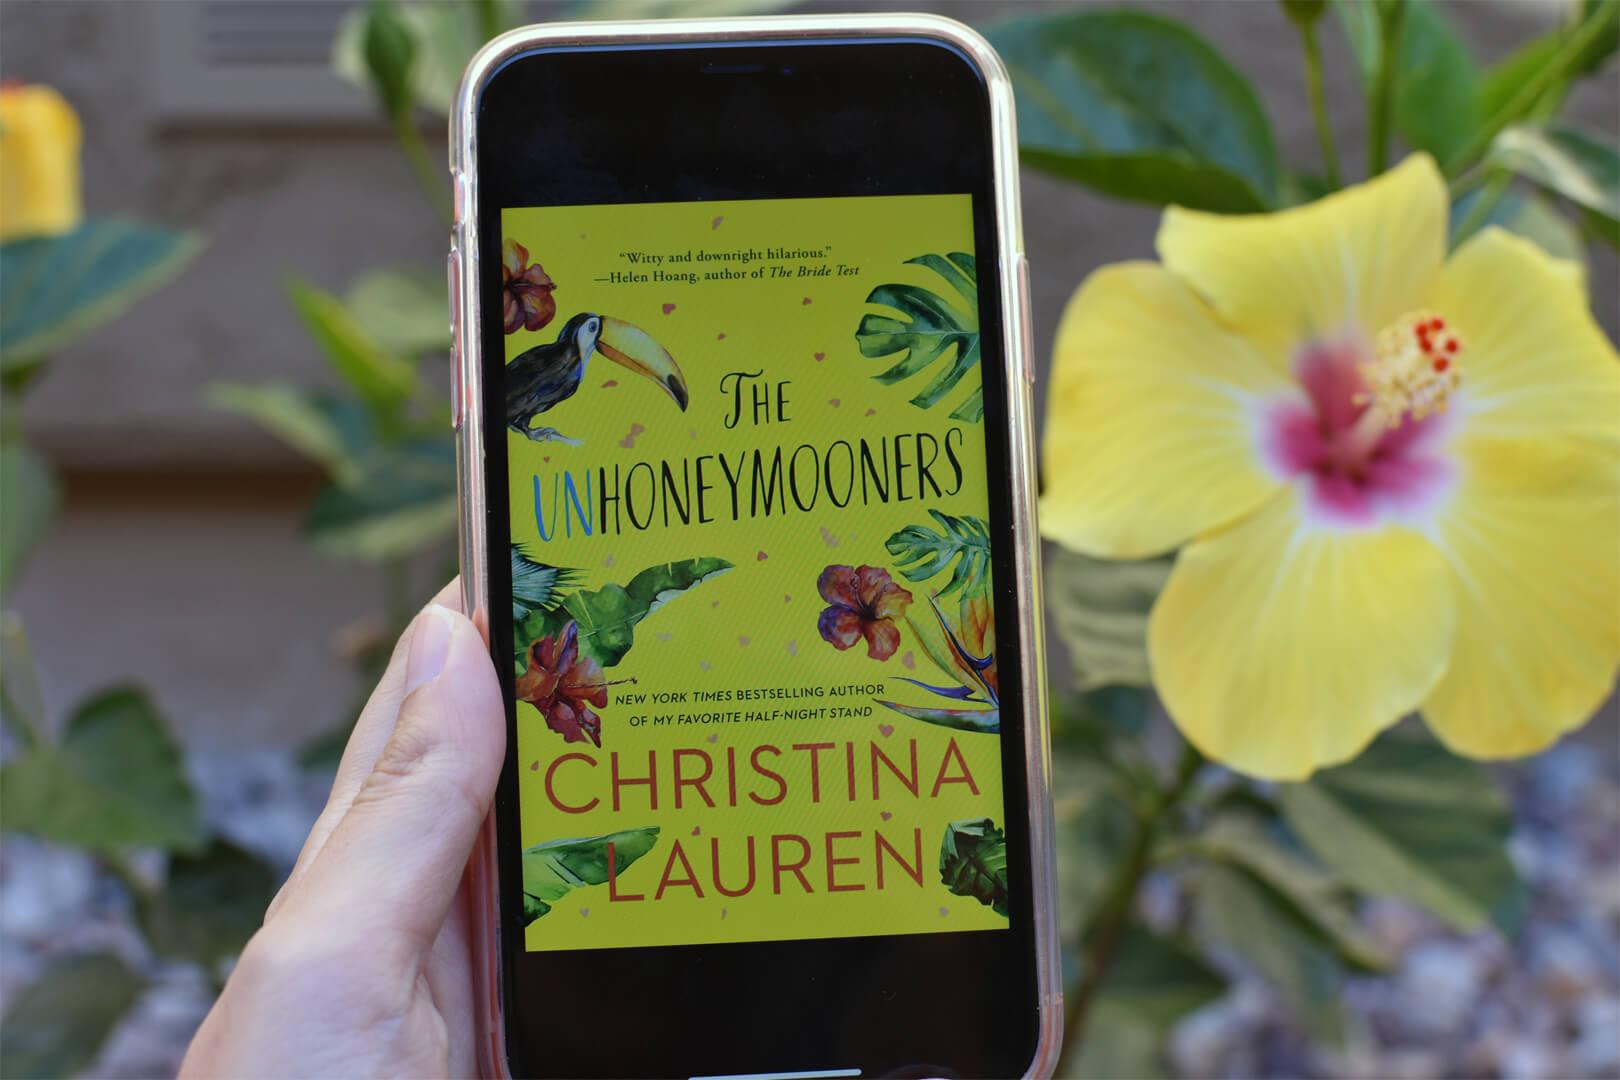 The UnHoneymooners Review